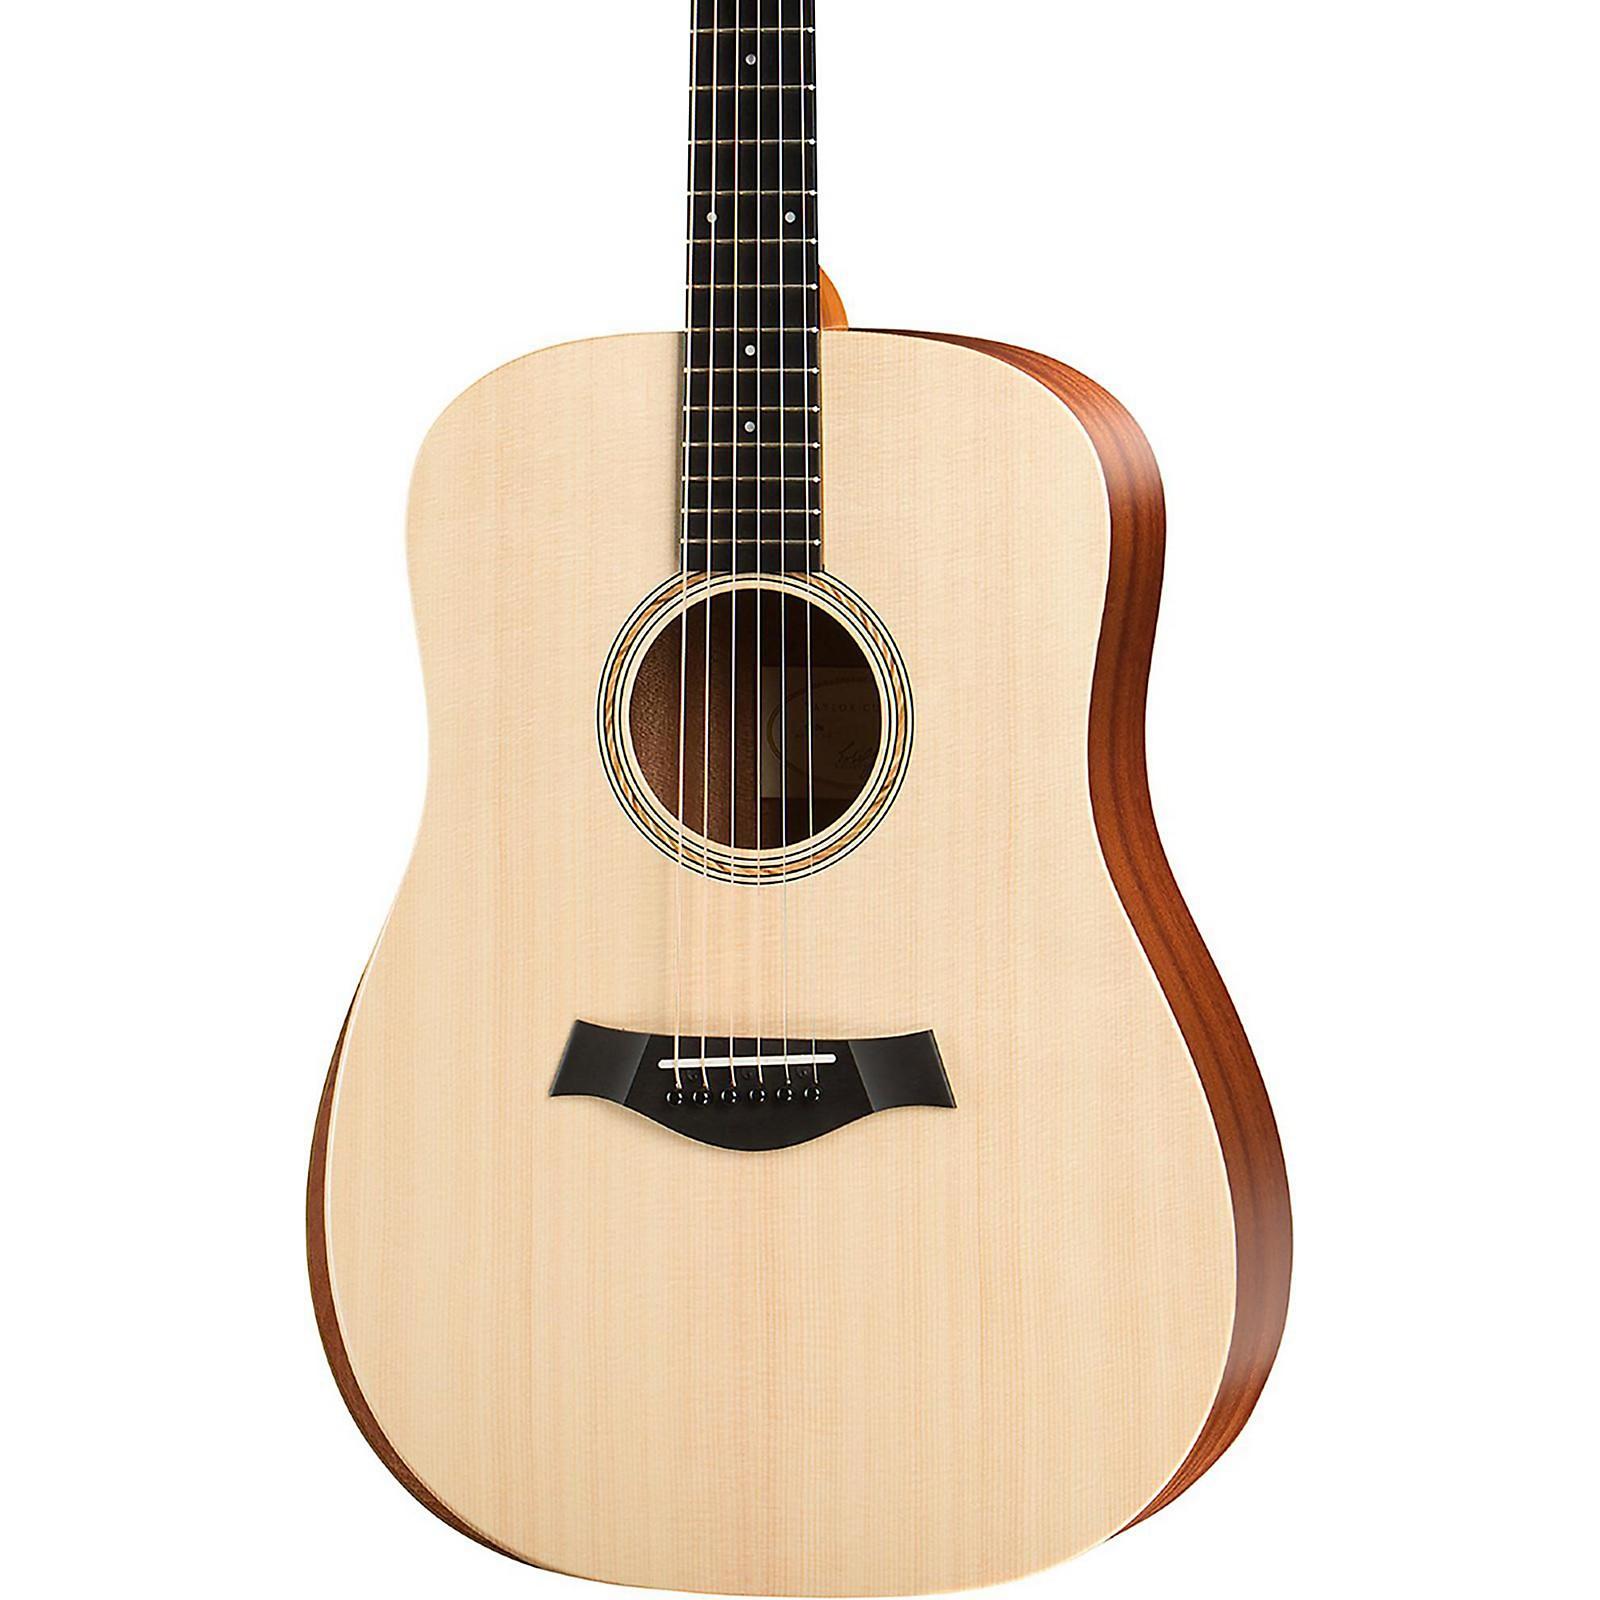 Taylor Academy Series Academy 10 Dreadnought Acoustic Guitar